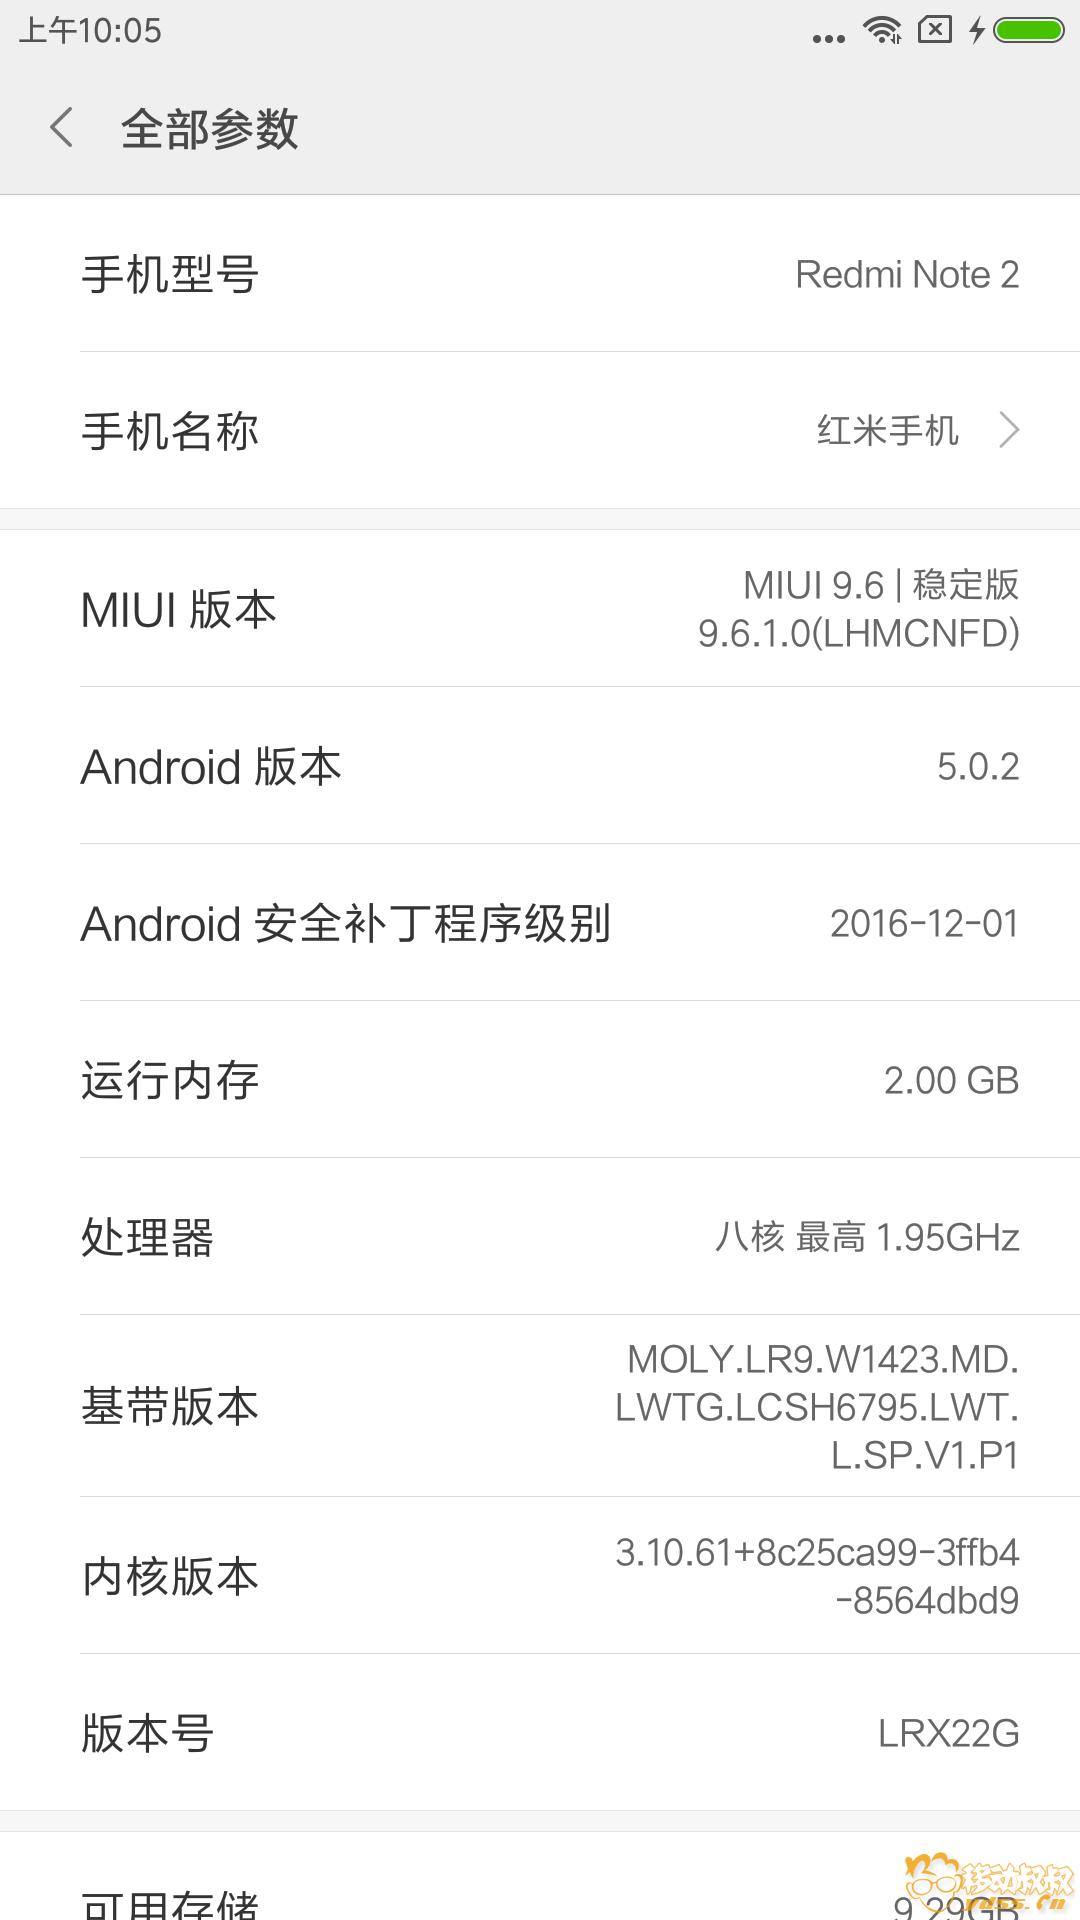 Screenshot_2018-09-08-10-05-19-602_com.android.settings.png